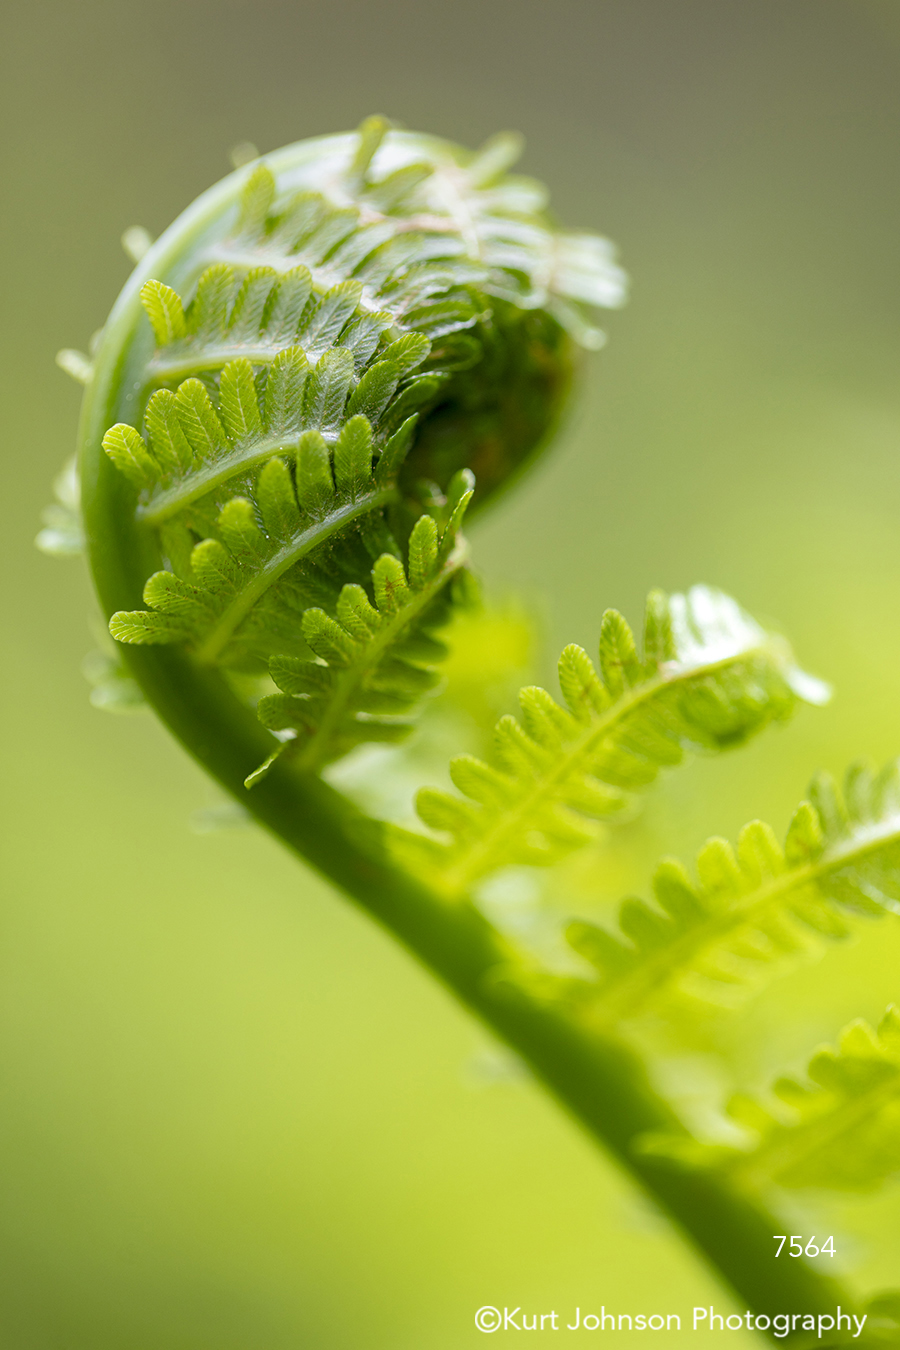 green bloom flower fern close up macro detail pattern leaf leaves